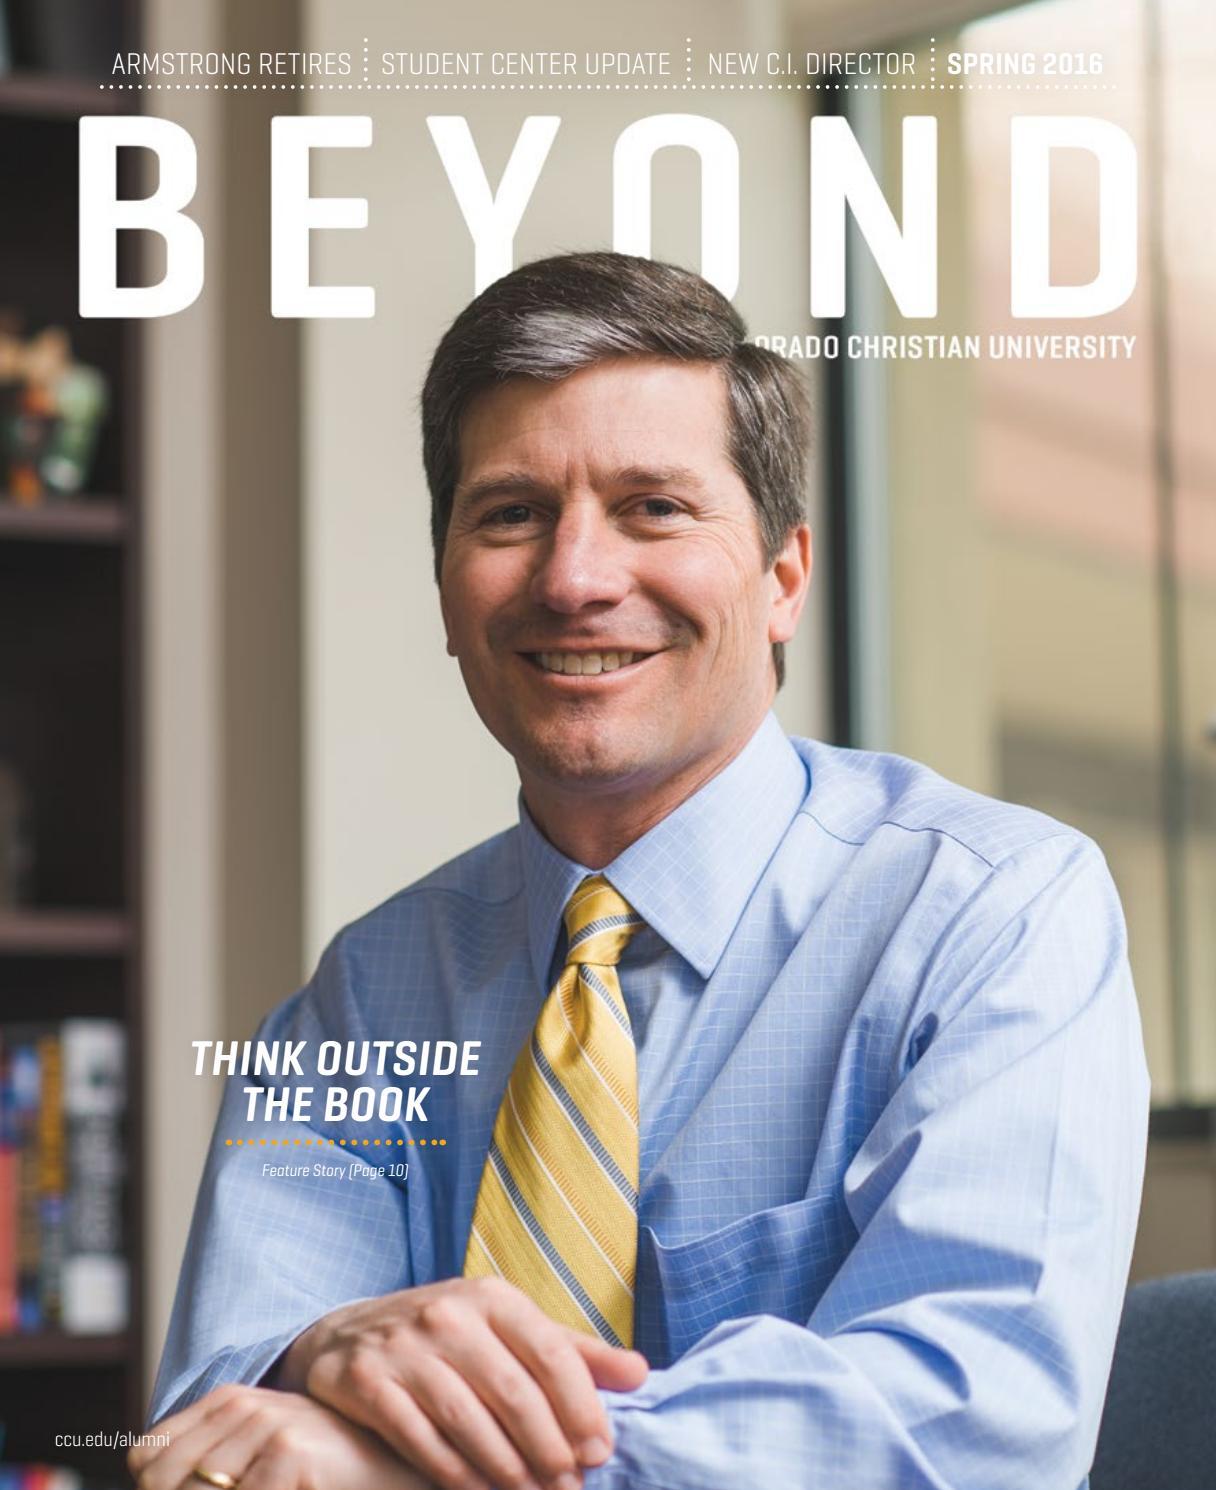 Beyond magazine spring 2016 by Colorado Christian University